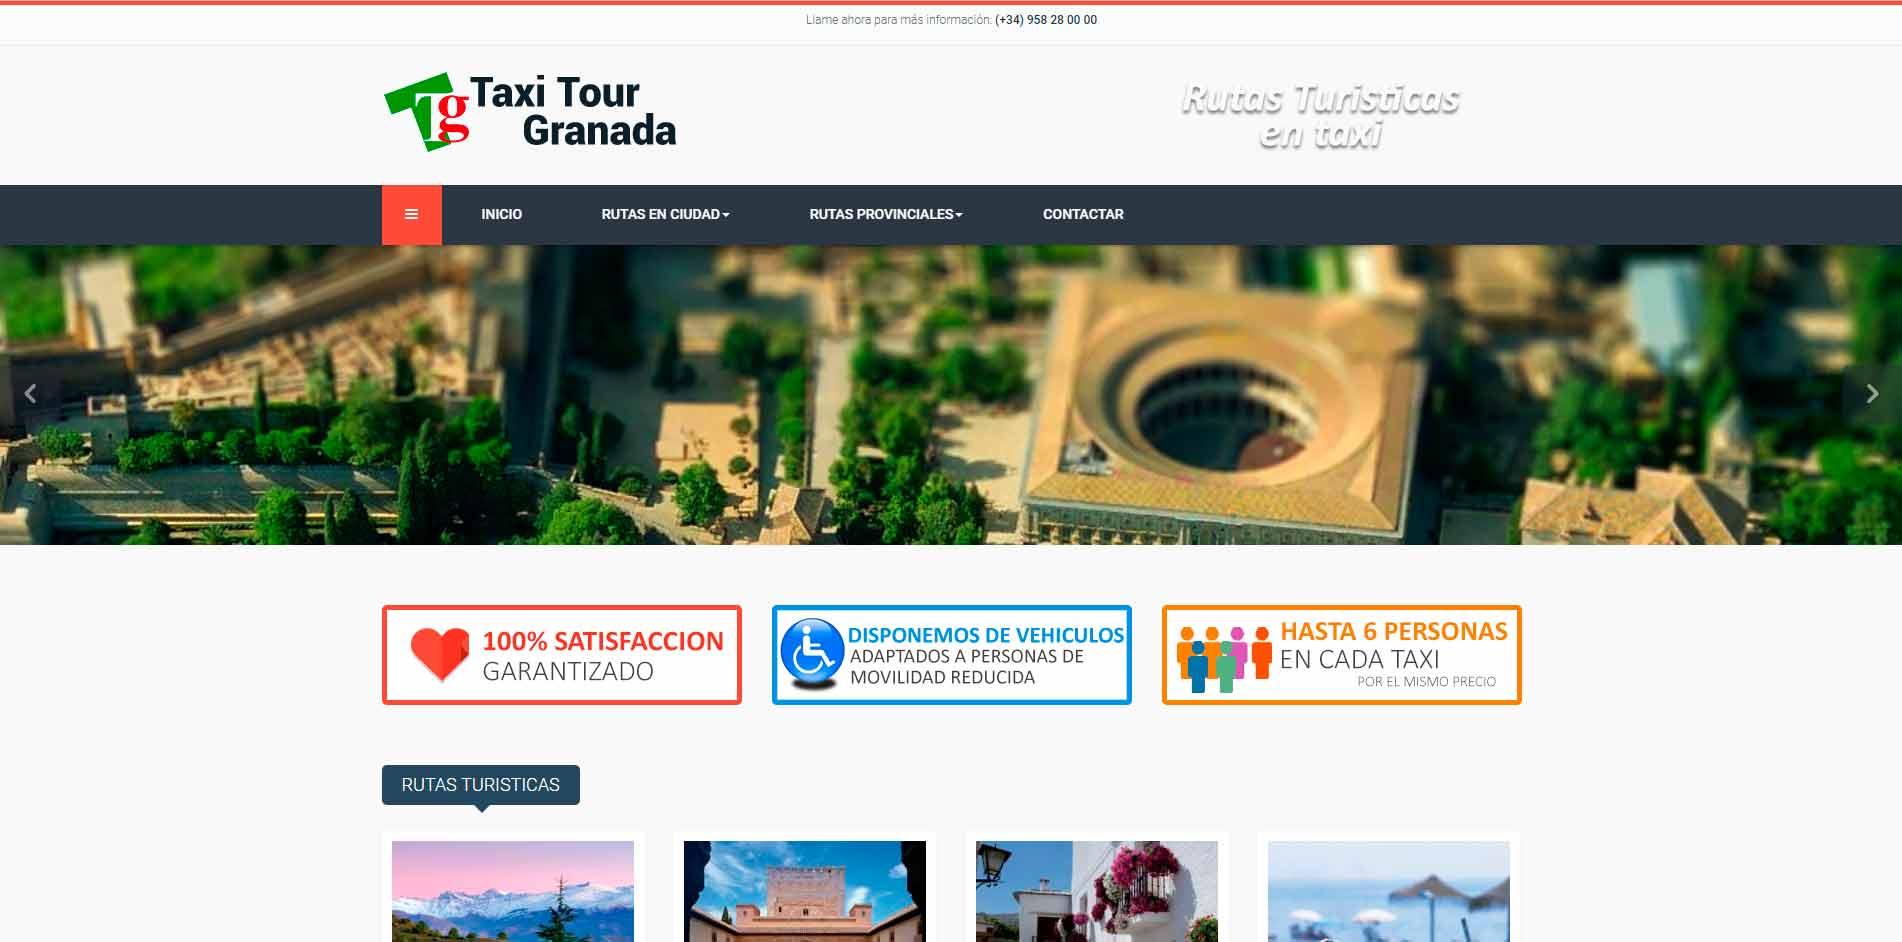 Taxi Tour Granada